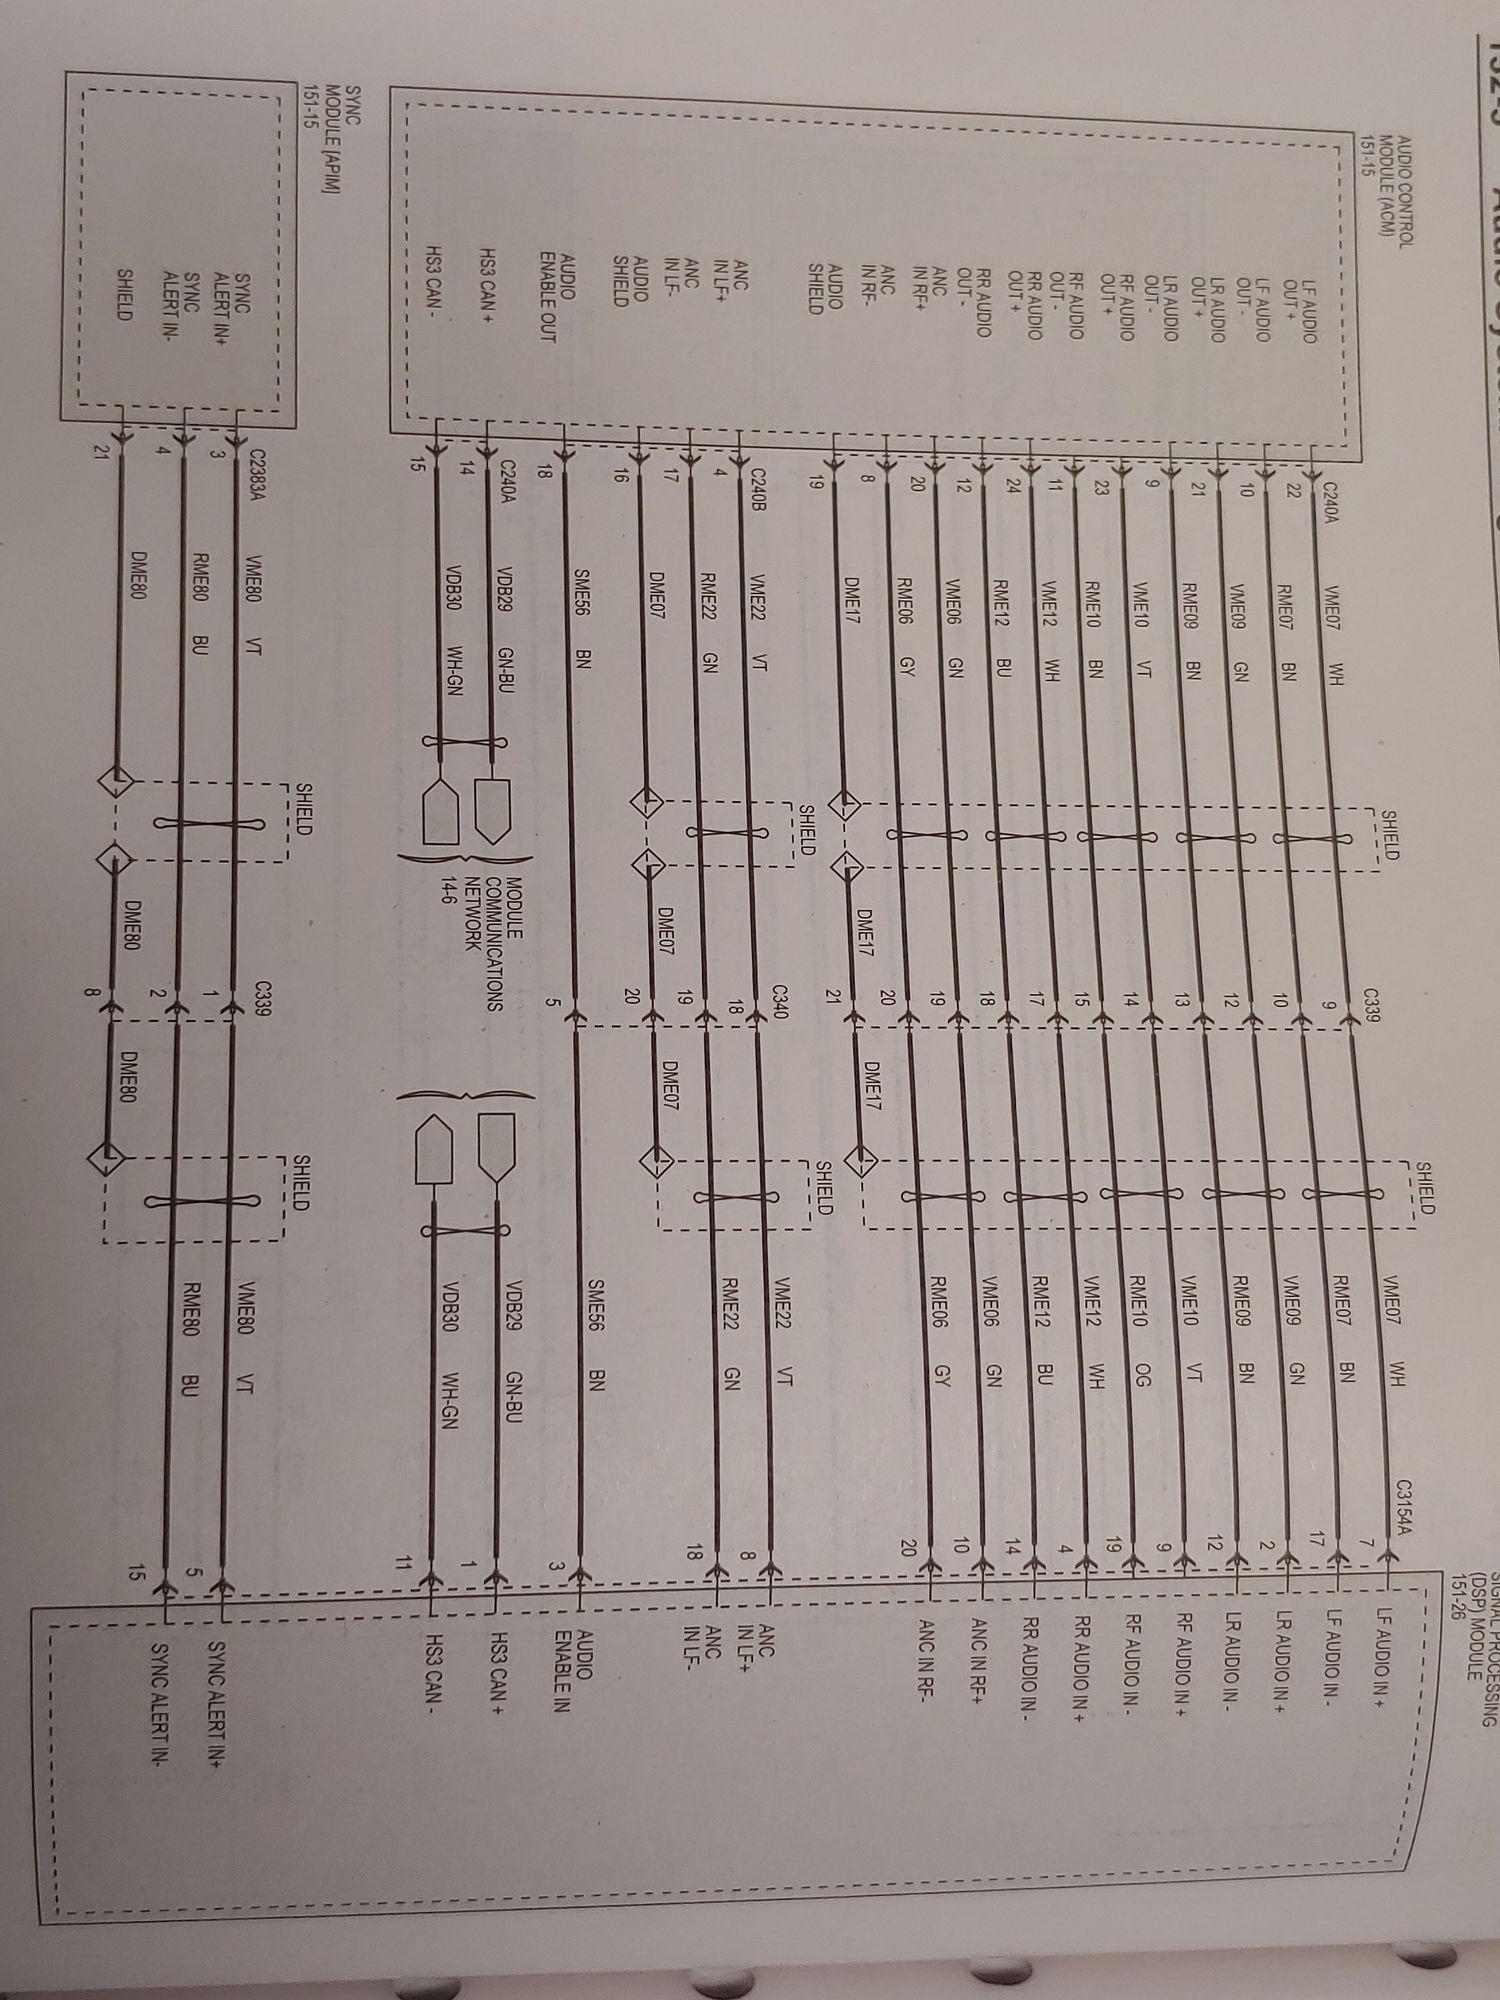 hight resolution of acm wiring diagram wiring diagram2018 f150 sync3 acm diagram ford f150 forum community of ford mix